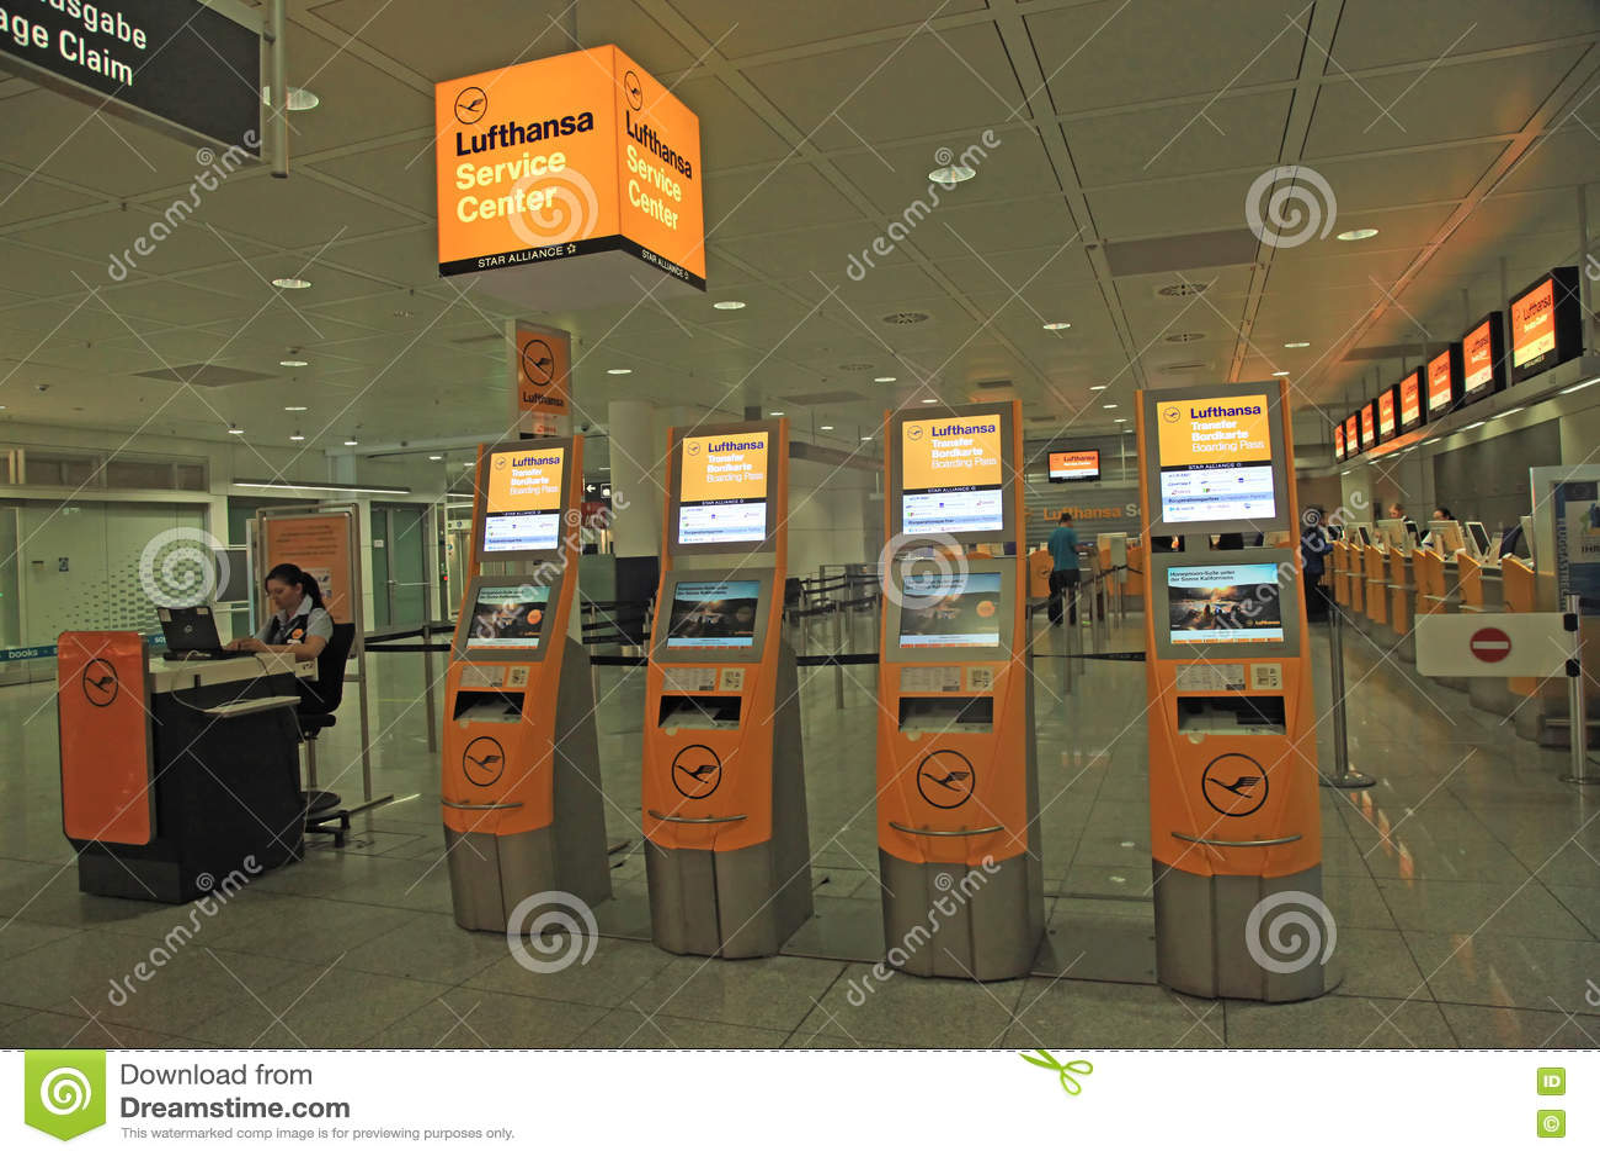 Lufthansa Service Center